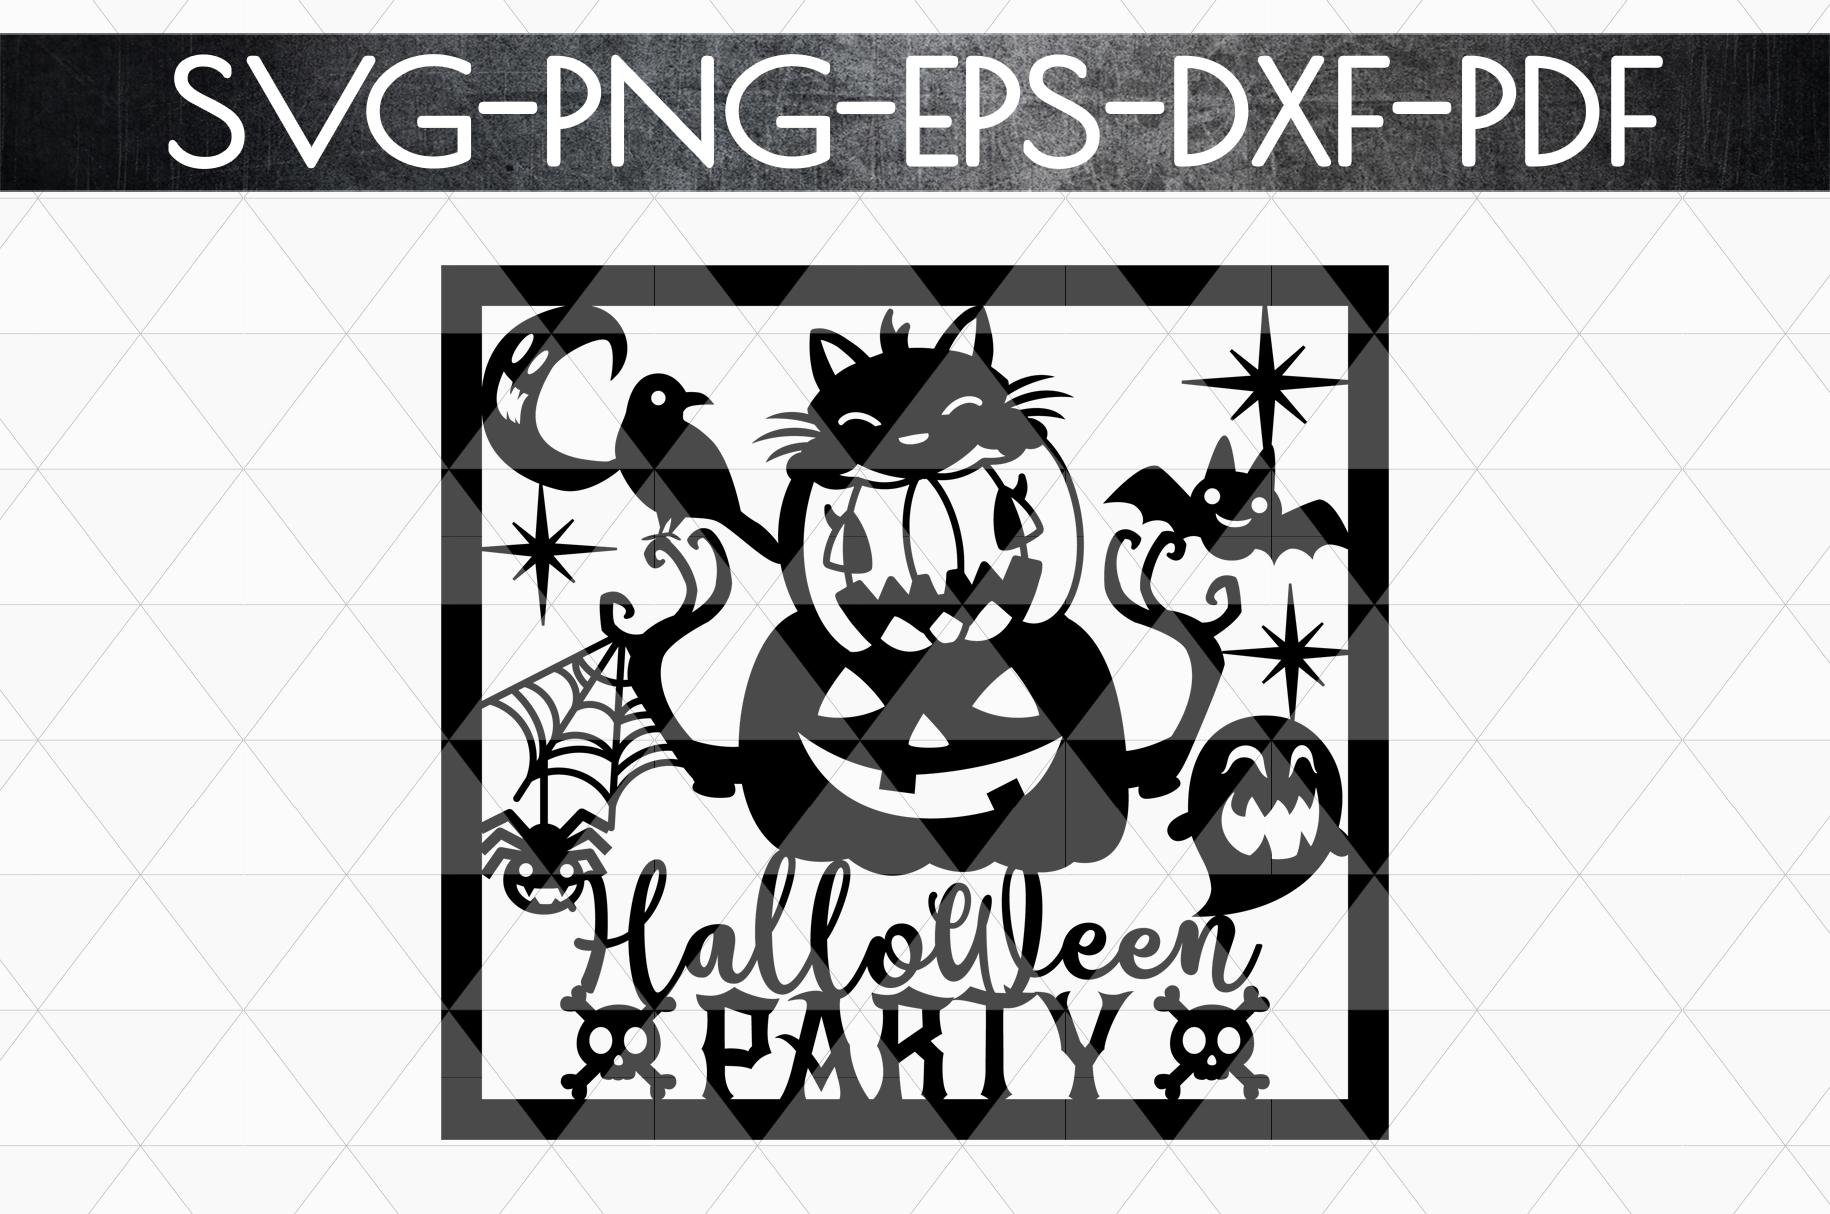 Halloween Party Papercut Template, Halloween Decor SVG, PDF example image 5